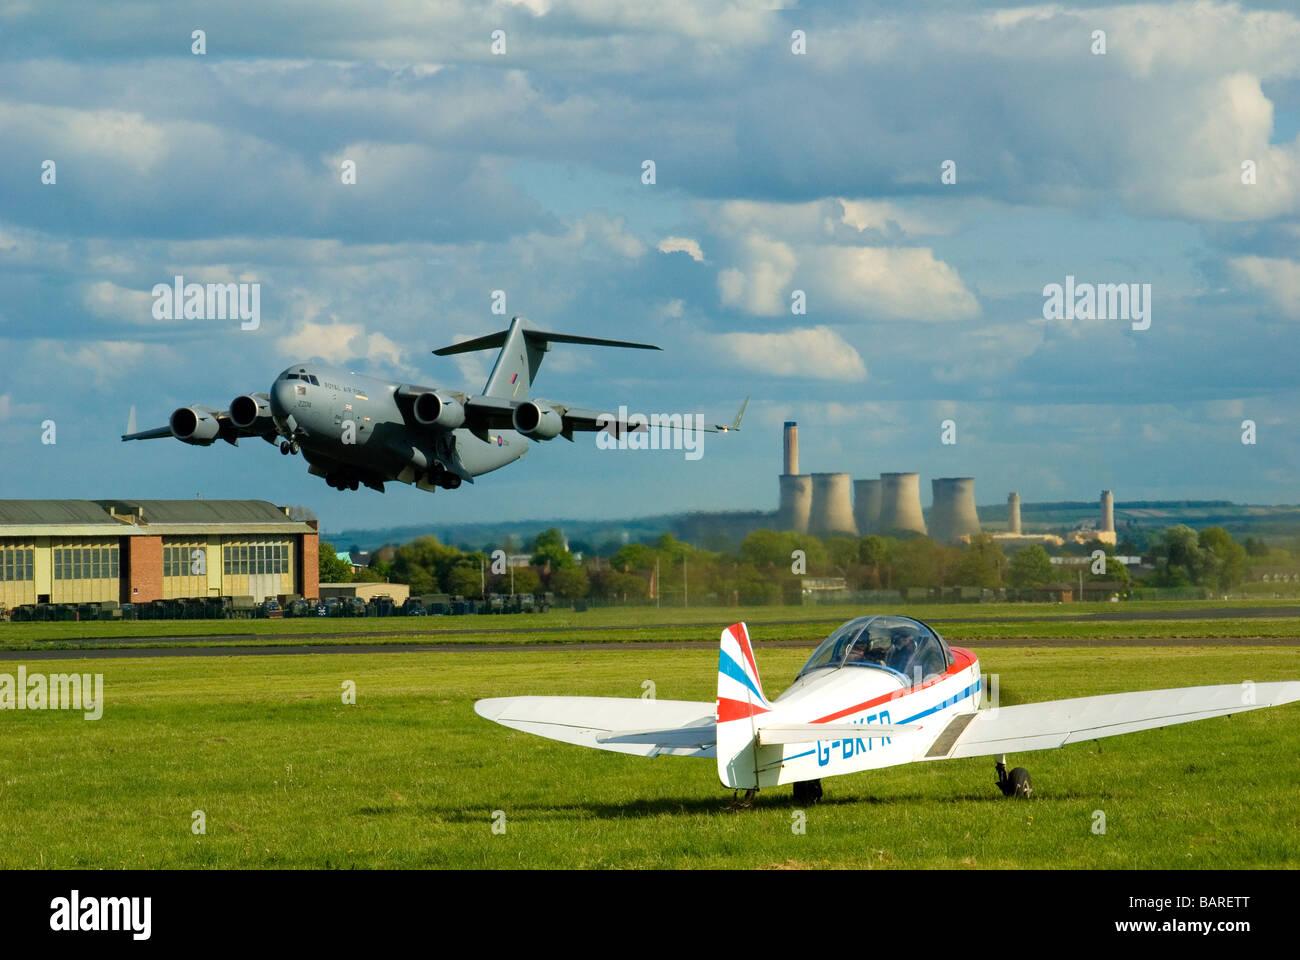 A C-17 Globemaster Military Transport Plane on Take Off - Stock Image